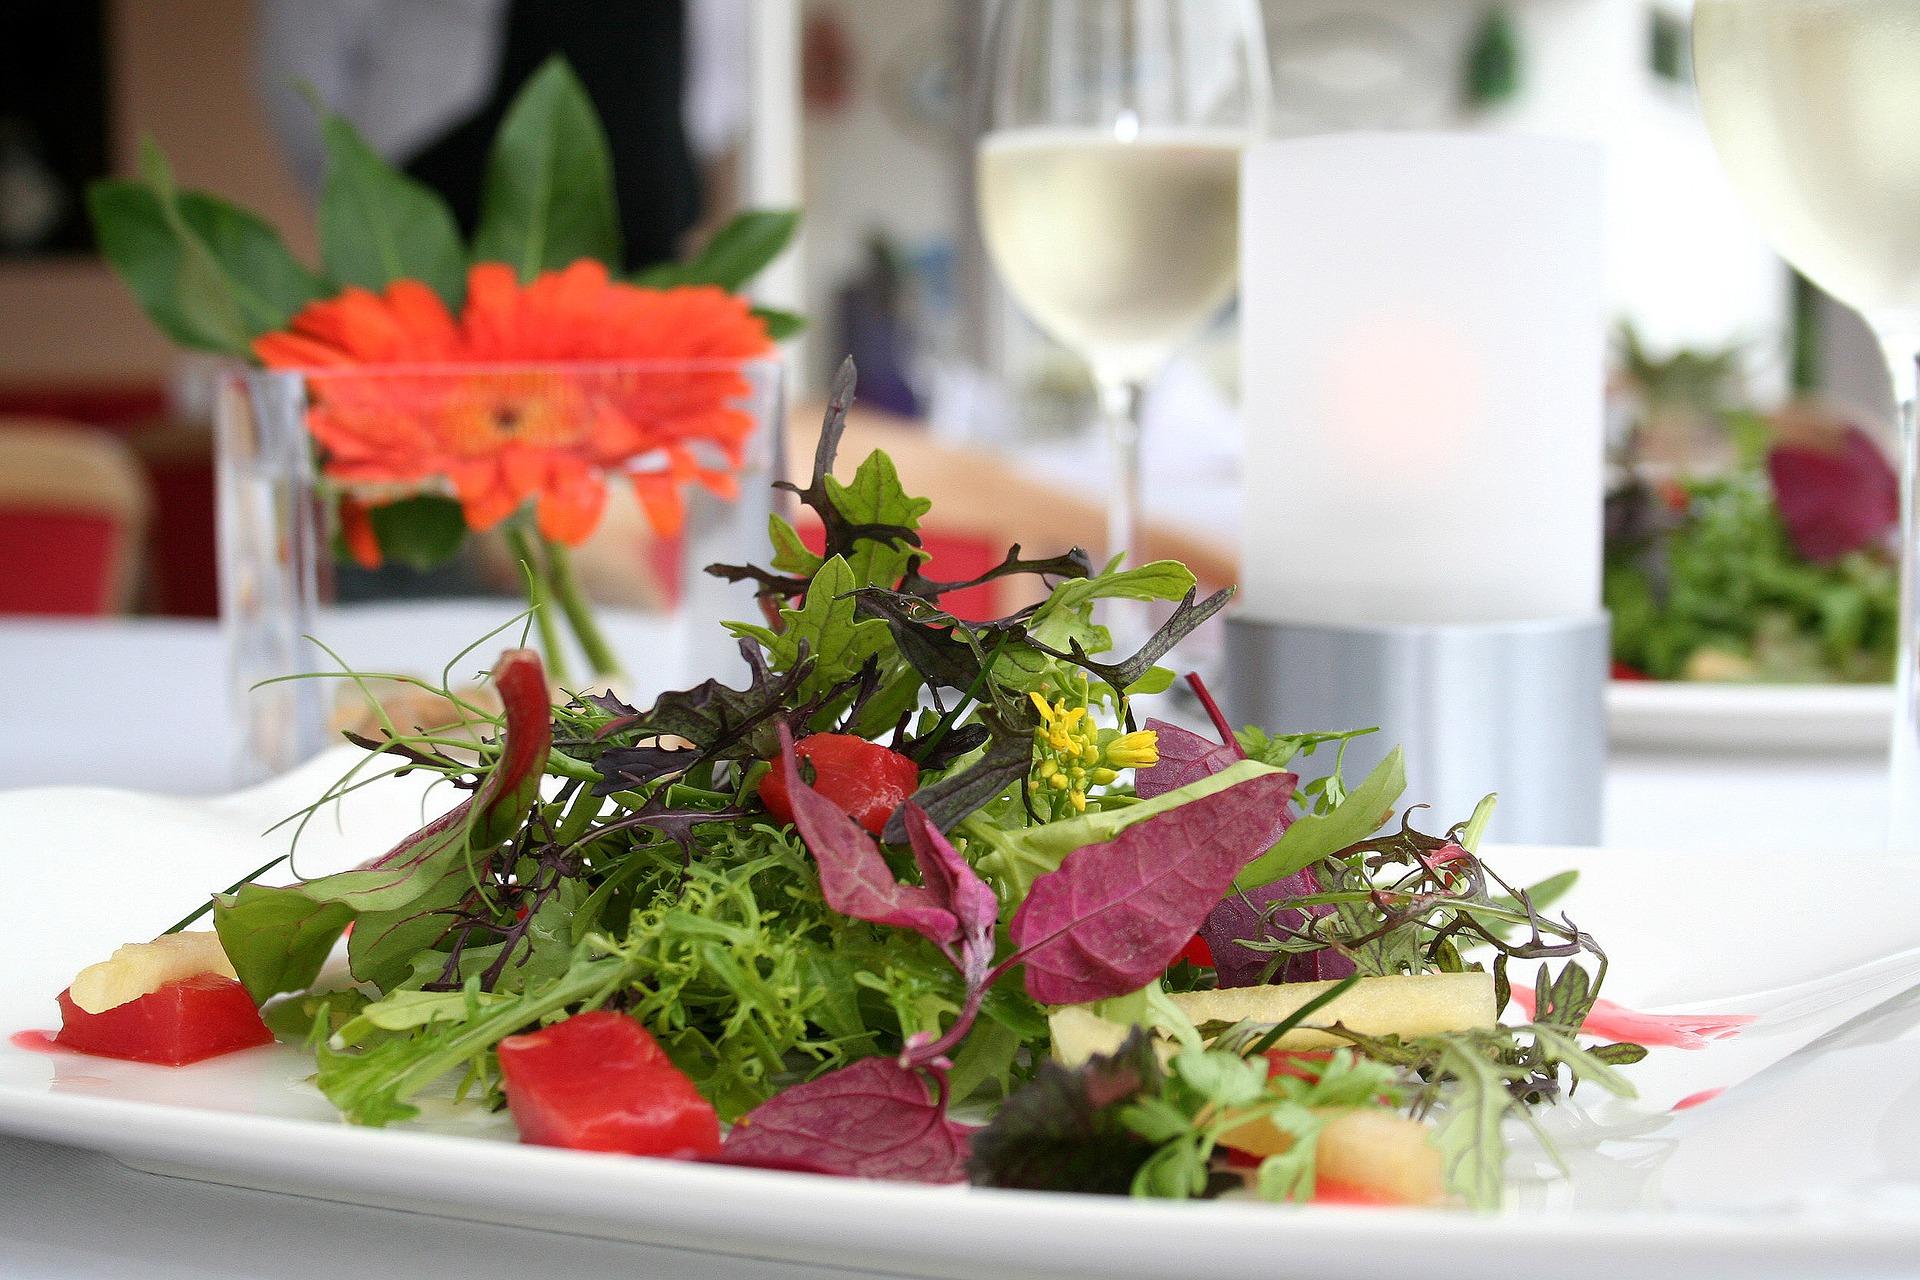 Healthy Eating….Fresh Herbs